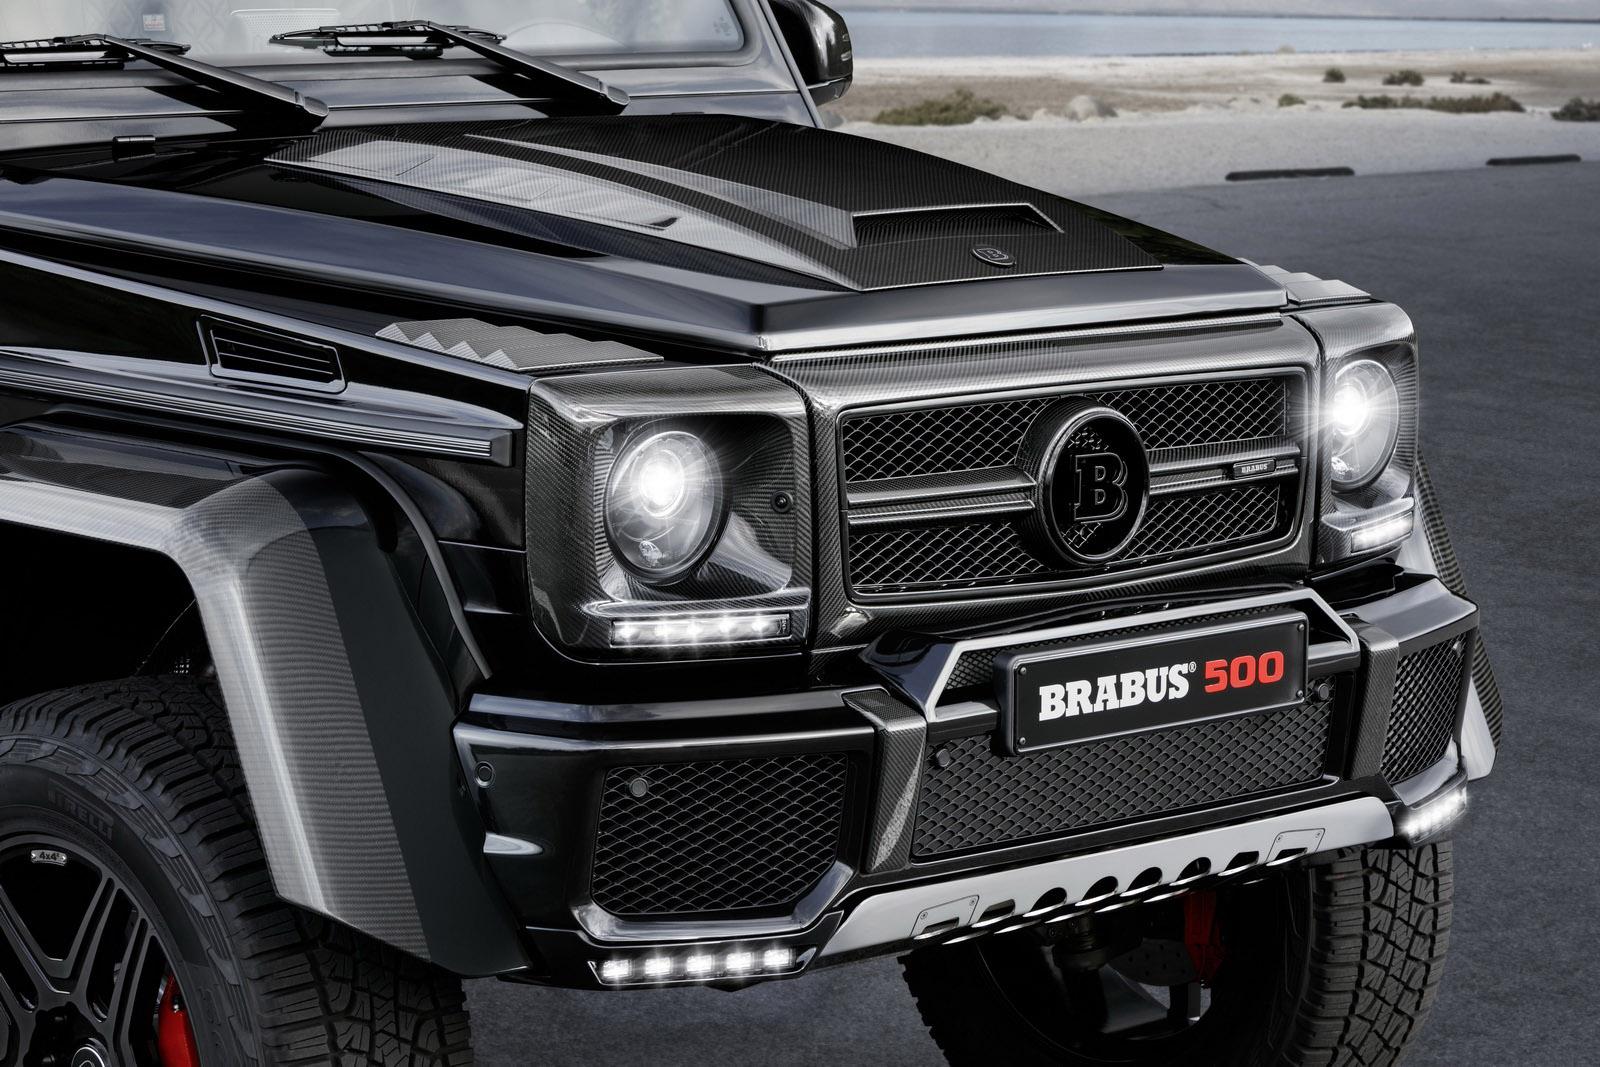 brabus announces mercedes benz g 500 4x4 project for. Black Bedroom Furniture Sets. Home Design Ideas